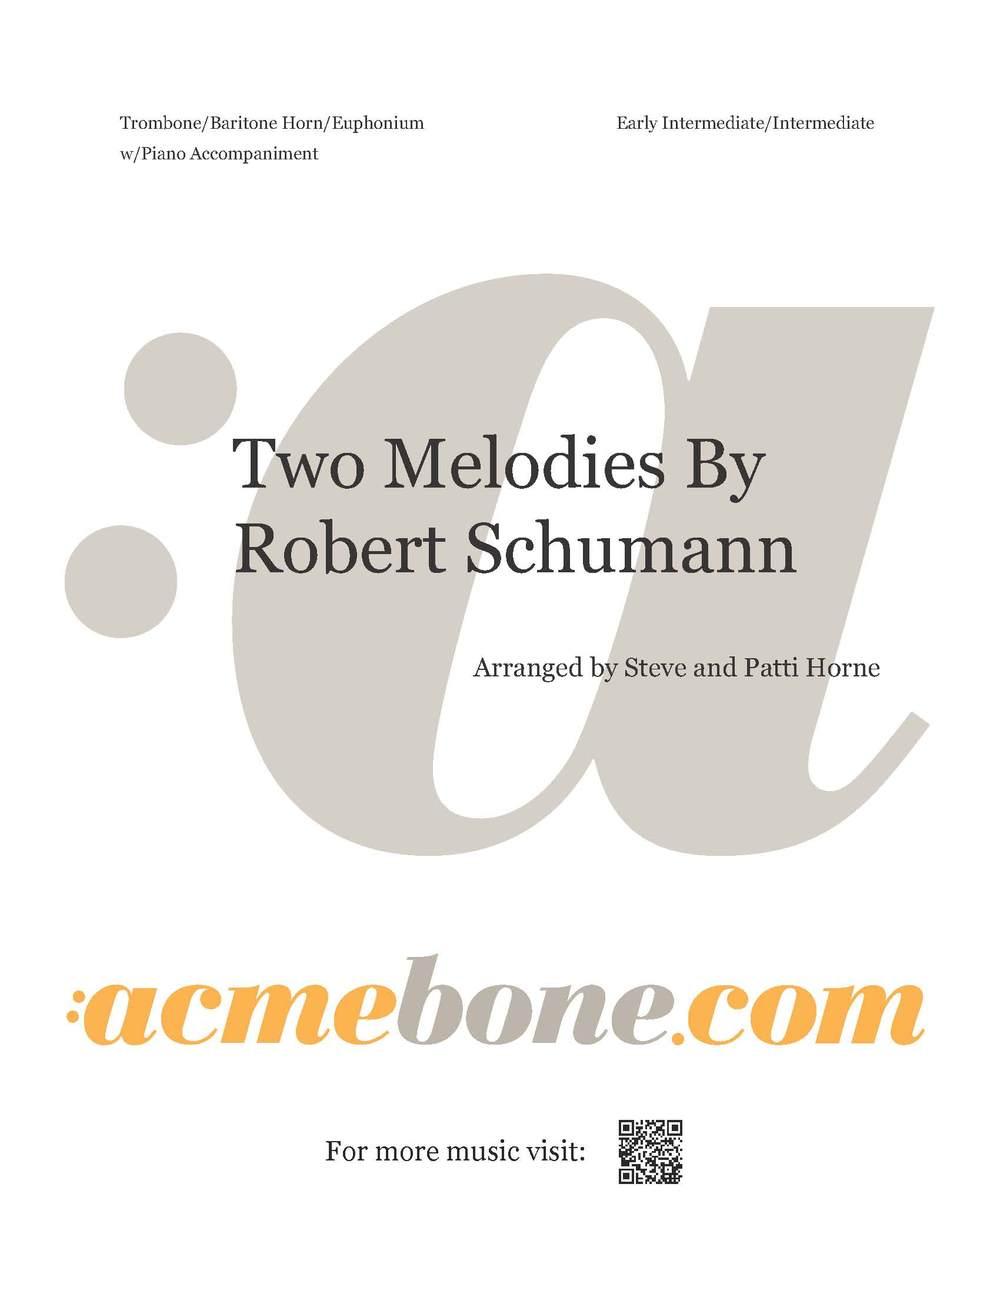 Two Melodies By Robert Schumann_digital_cover.jpg